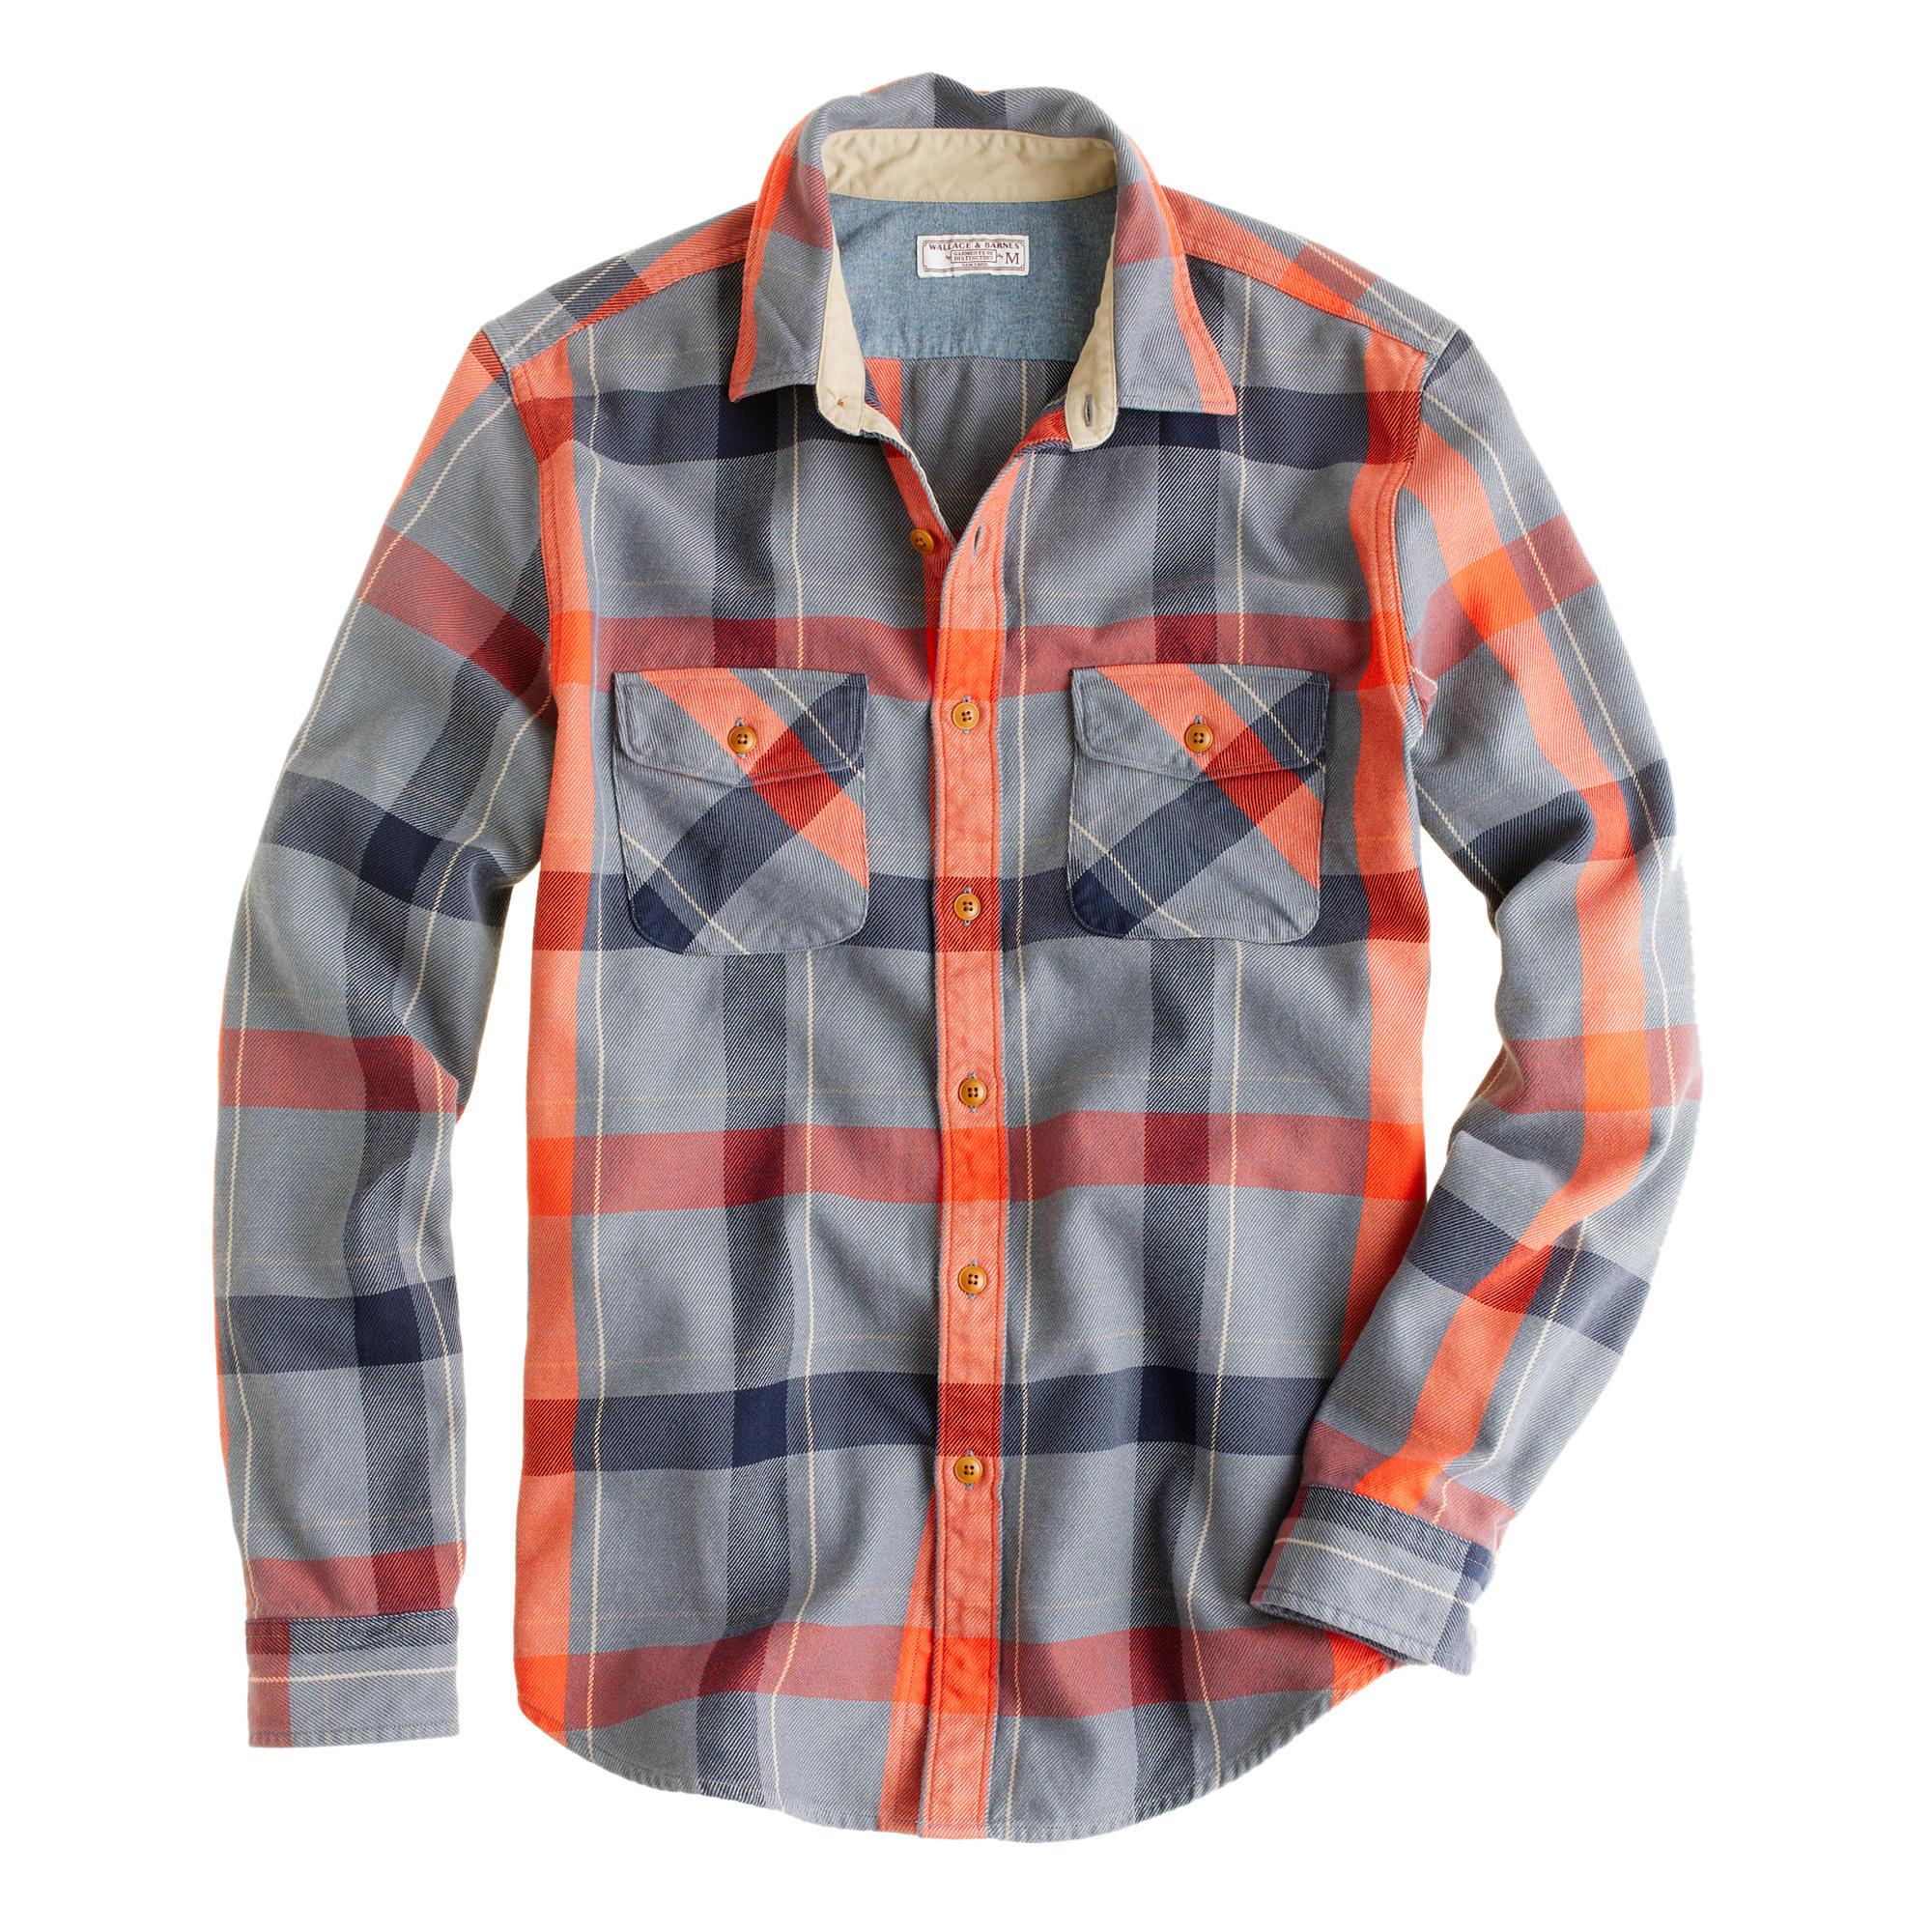 Wallace Barnes Heavyweight Flannel Shirt In Faded Plaid